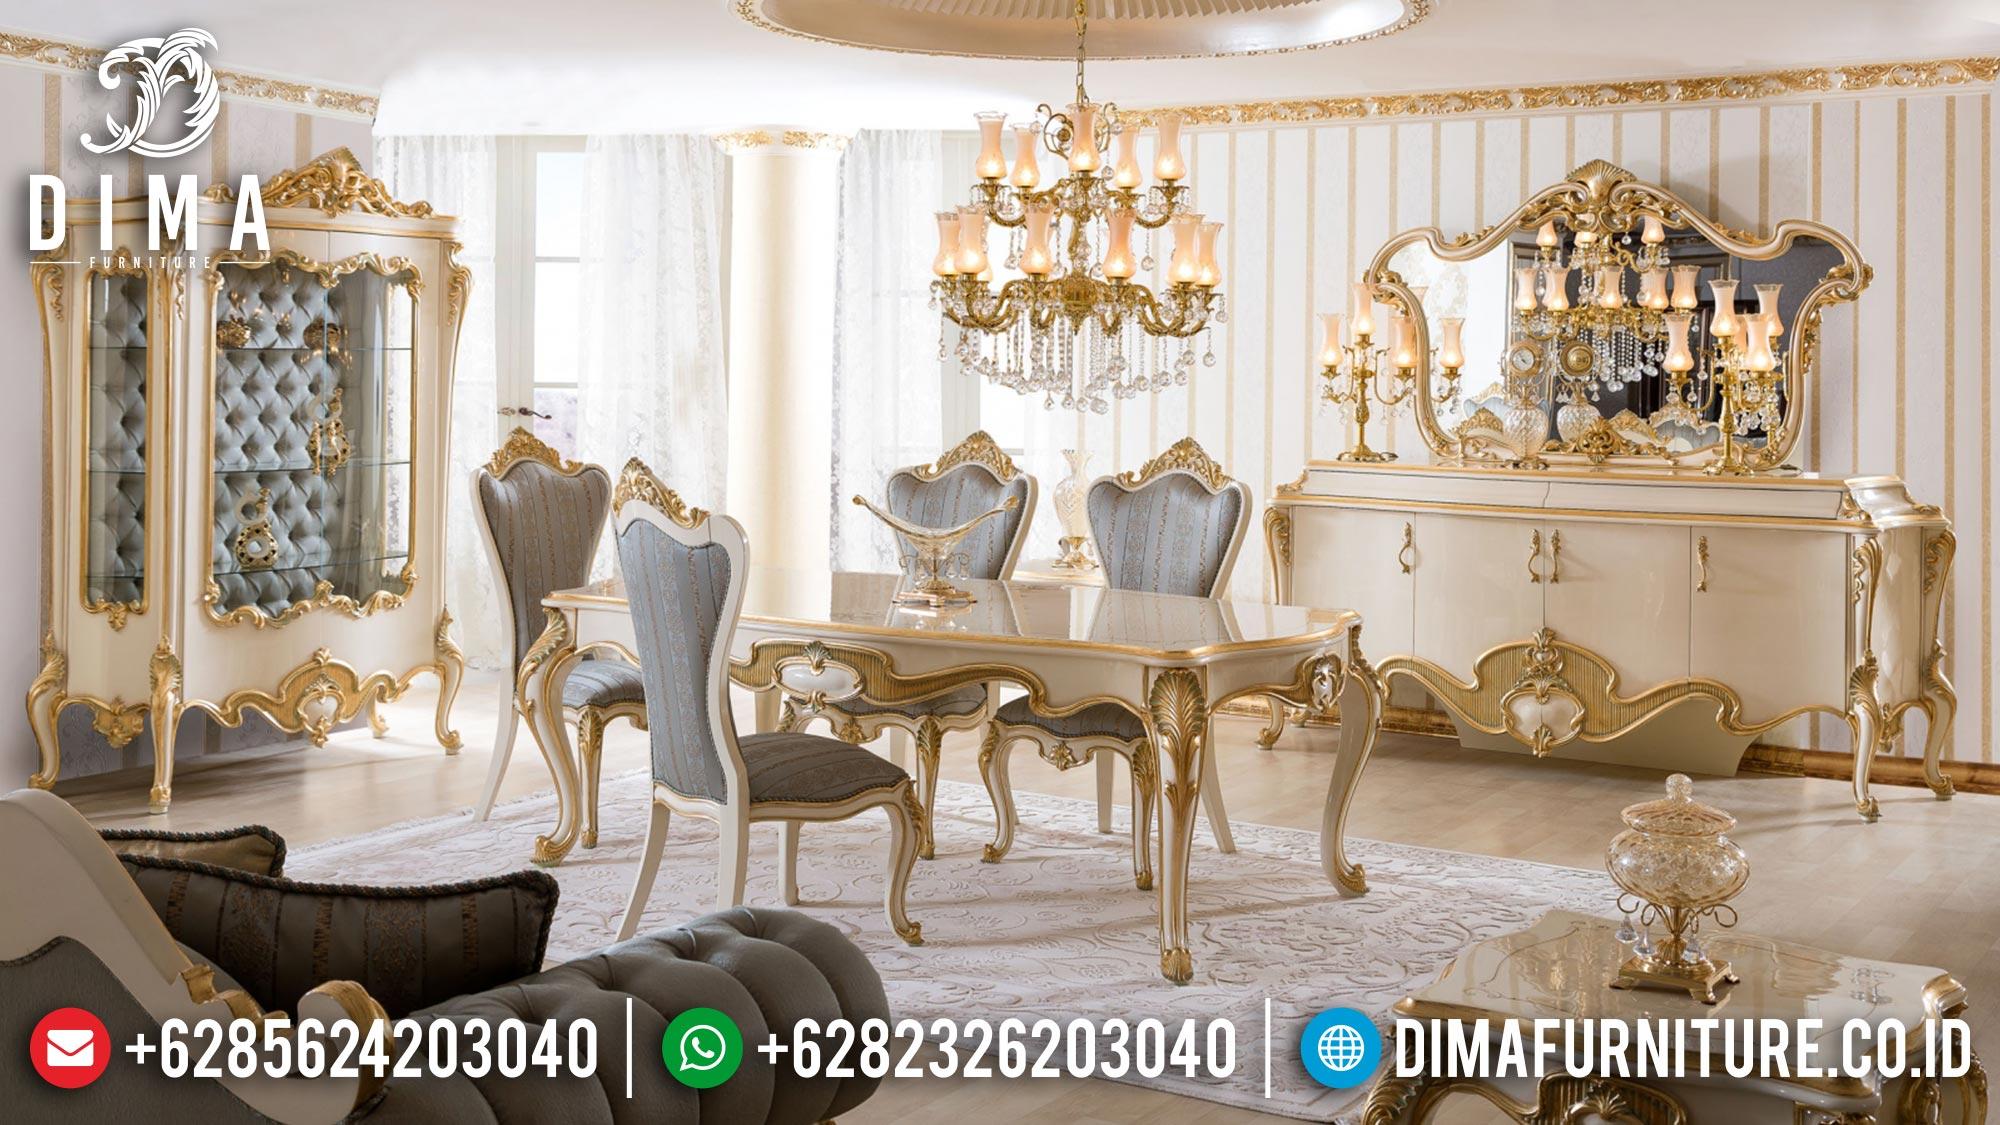 Desain Meja Makan Mewah Ukir Golden Leaf Luxury Royals Furniture Jepara MM-0874